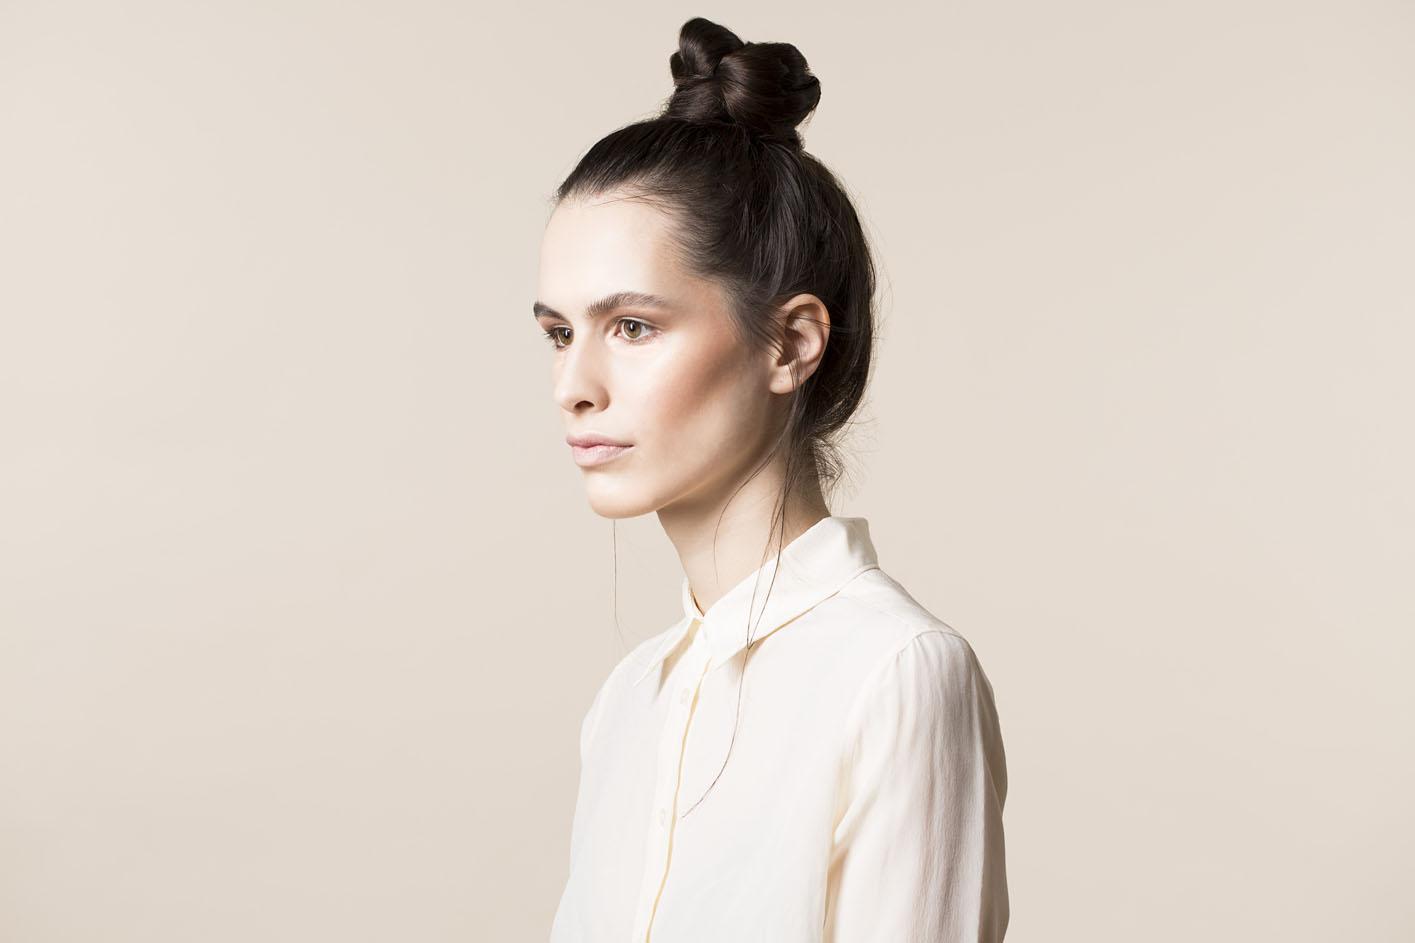 Photo: studio beauty cosmetics campaign photographer Margaret Yescombe, Make-Up Artist Hairstylist Dorota Nowacka, Model Elisabeth. Pale look, cream shirt, hair bun knot, profile portrait image